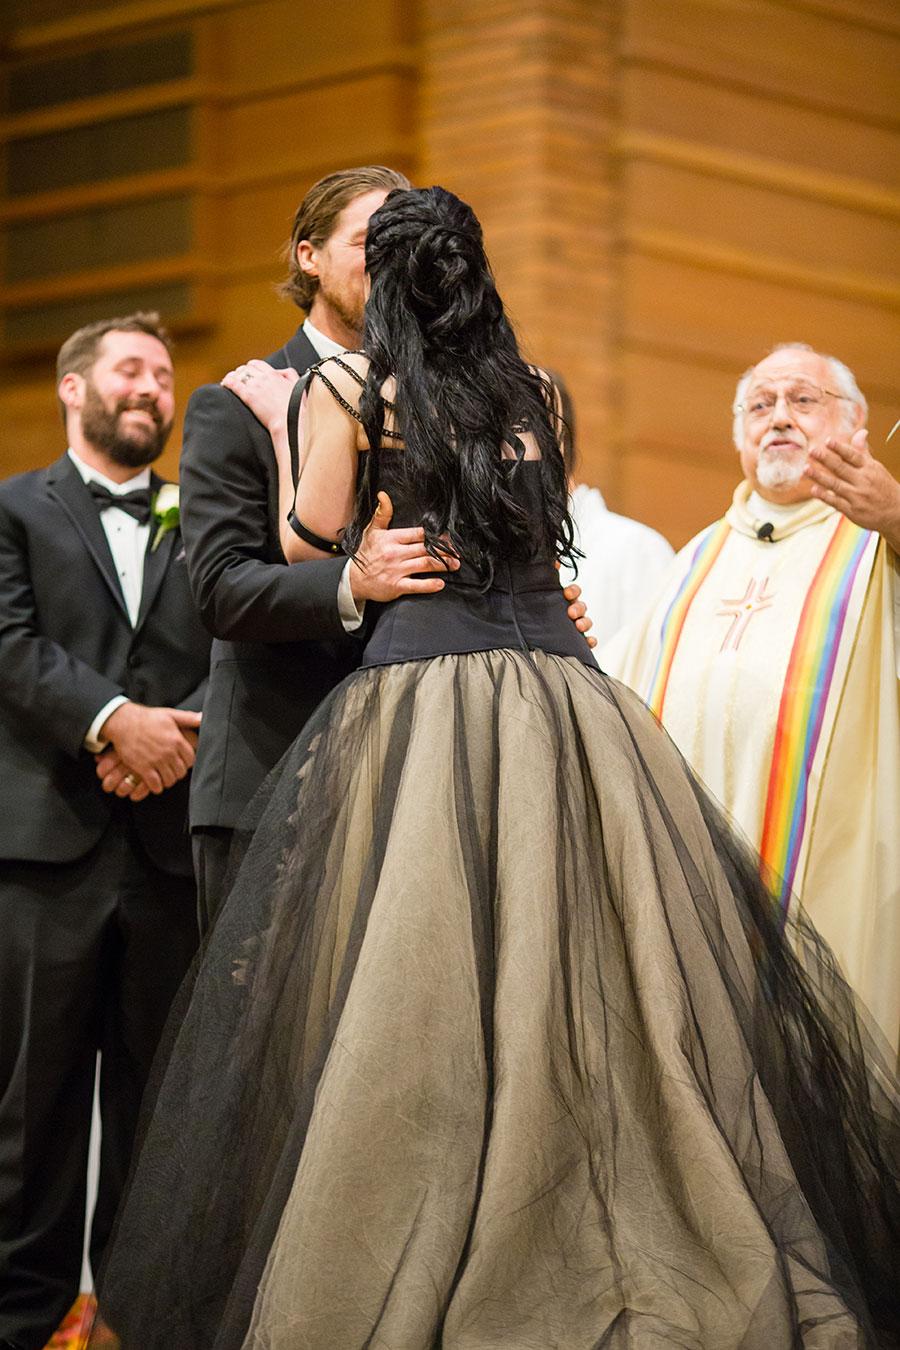 dark-sparkly-halloween-wedding-with-black-vera-wang-wedding-gown12